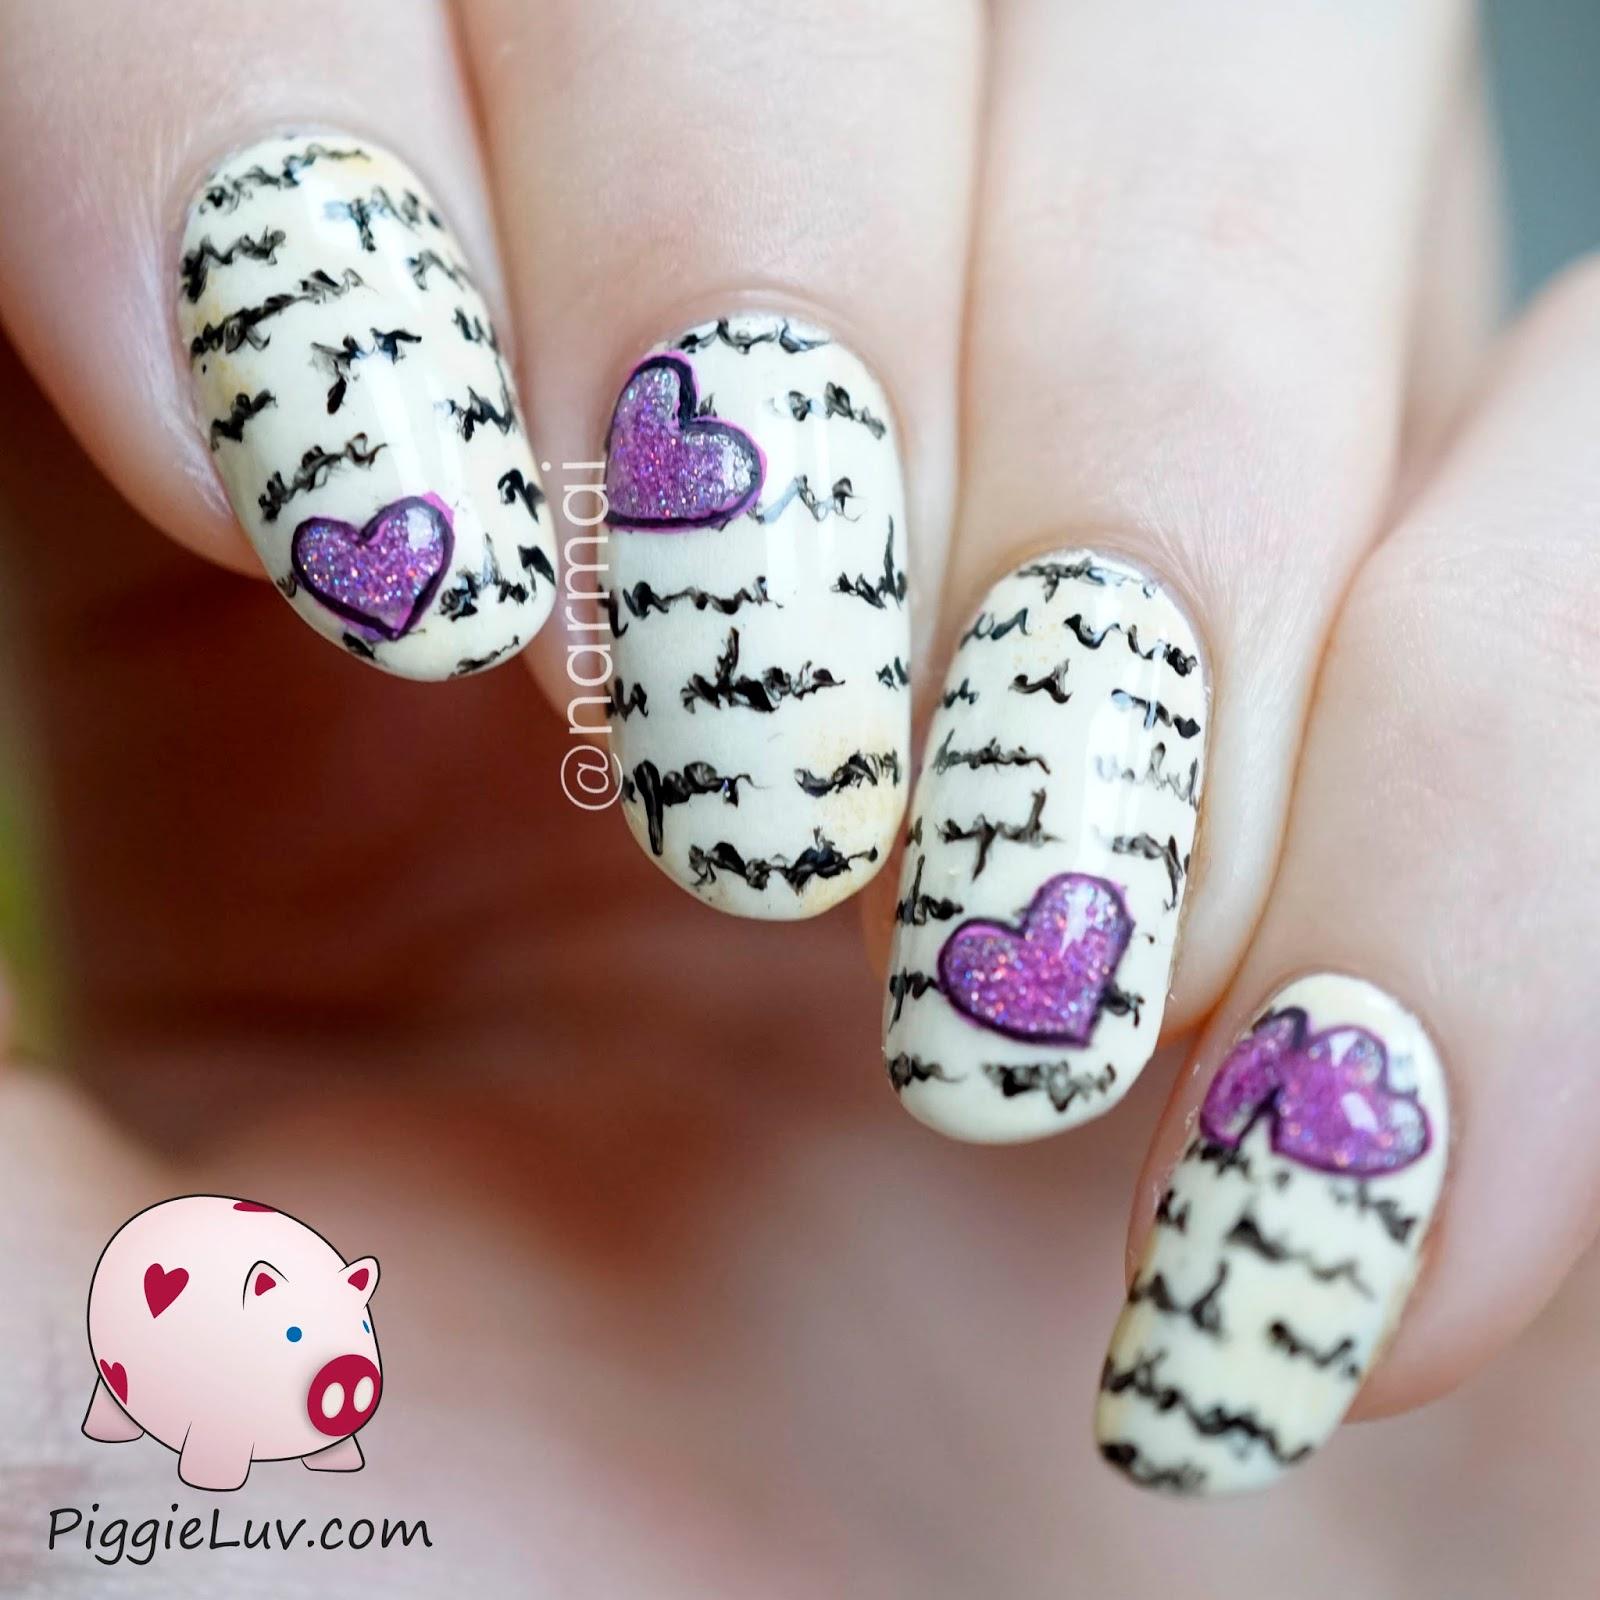 PiggieLuv: Love letter nail art - HPB Valentine\'s Day linkup